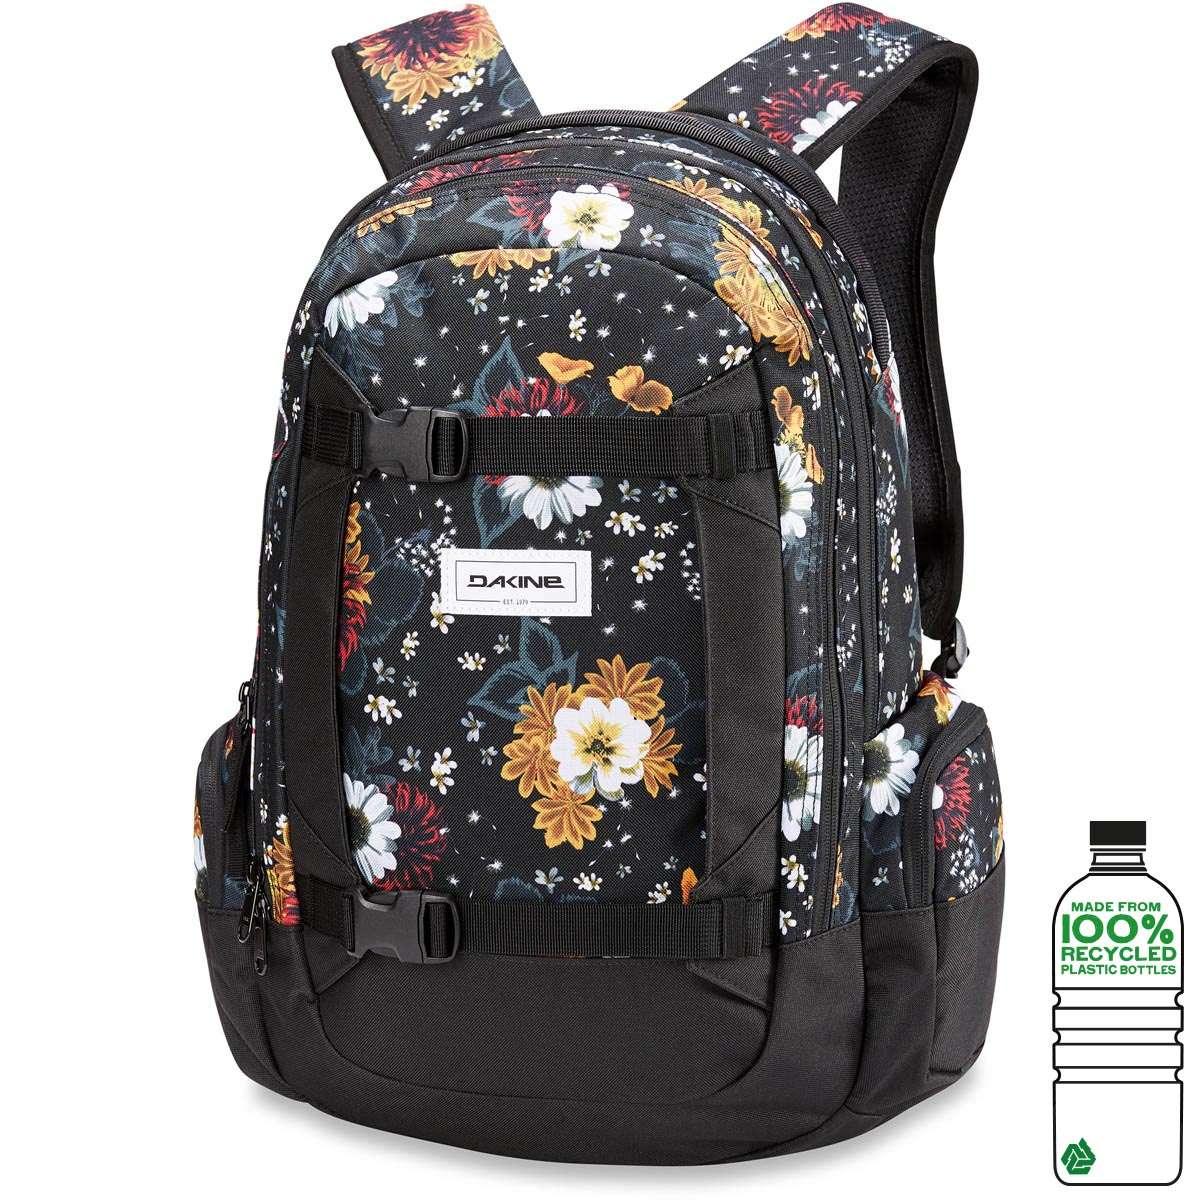 80c45612205 Dakine Womens Mission 25L Backpack Winter Daisy | Dakine Shop